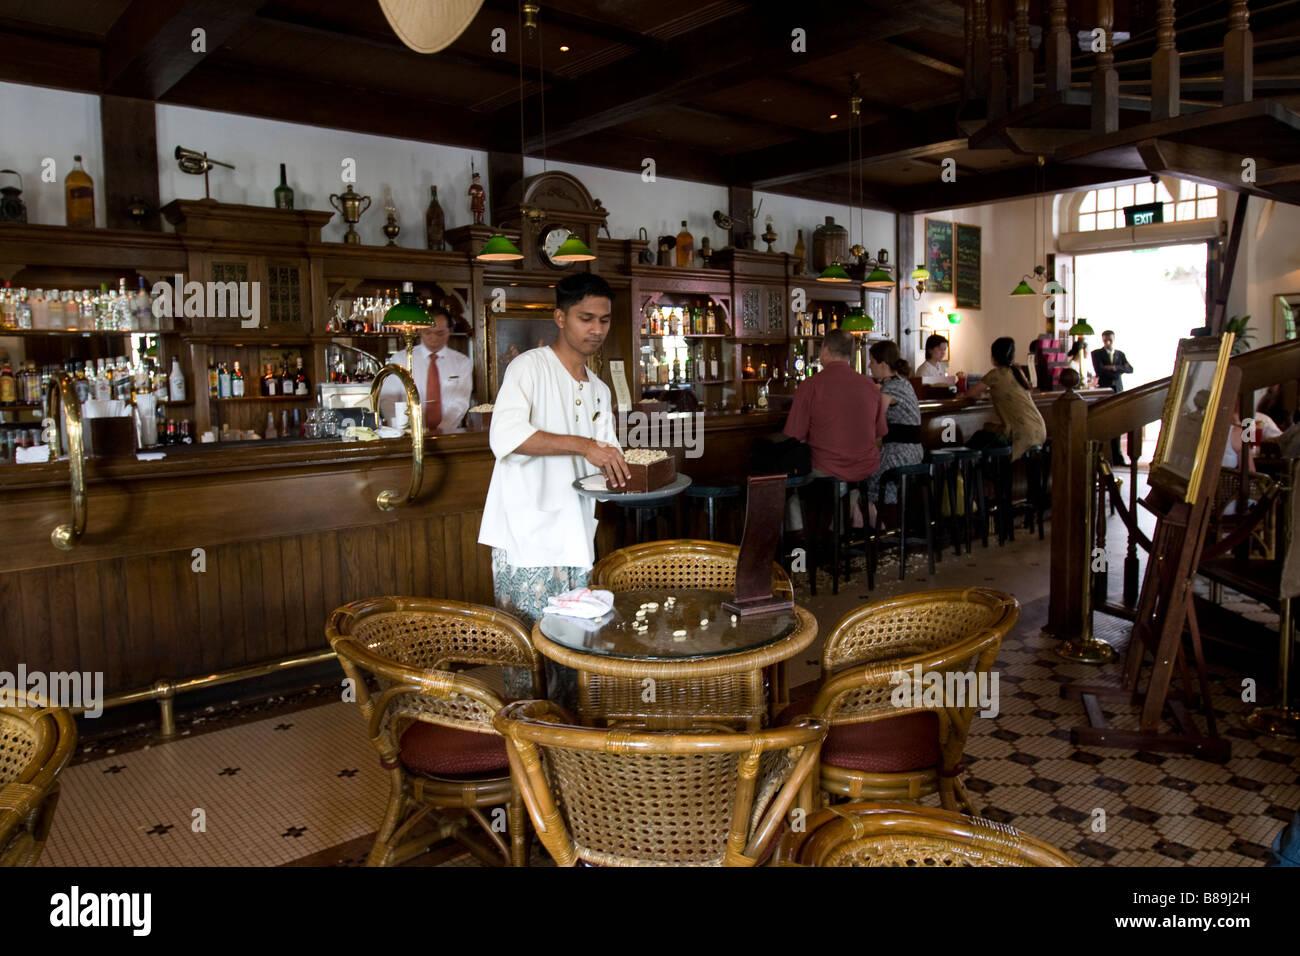 The Long bar at Raffles hotel Singapore - Stock Image